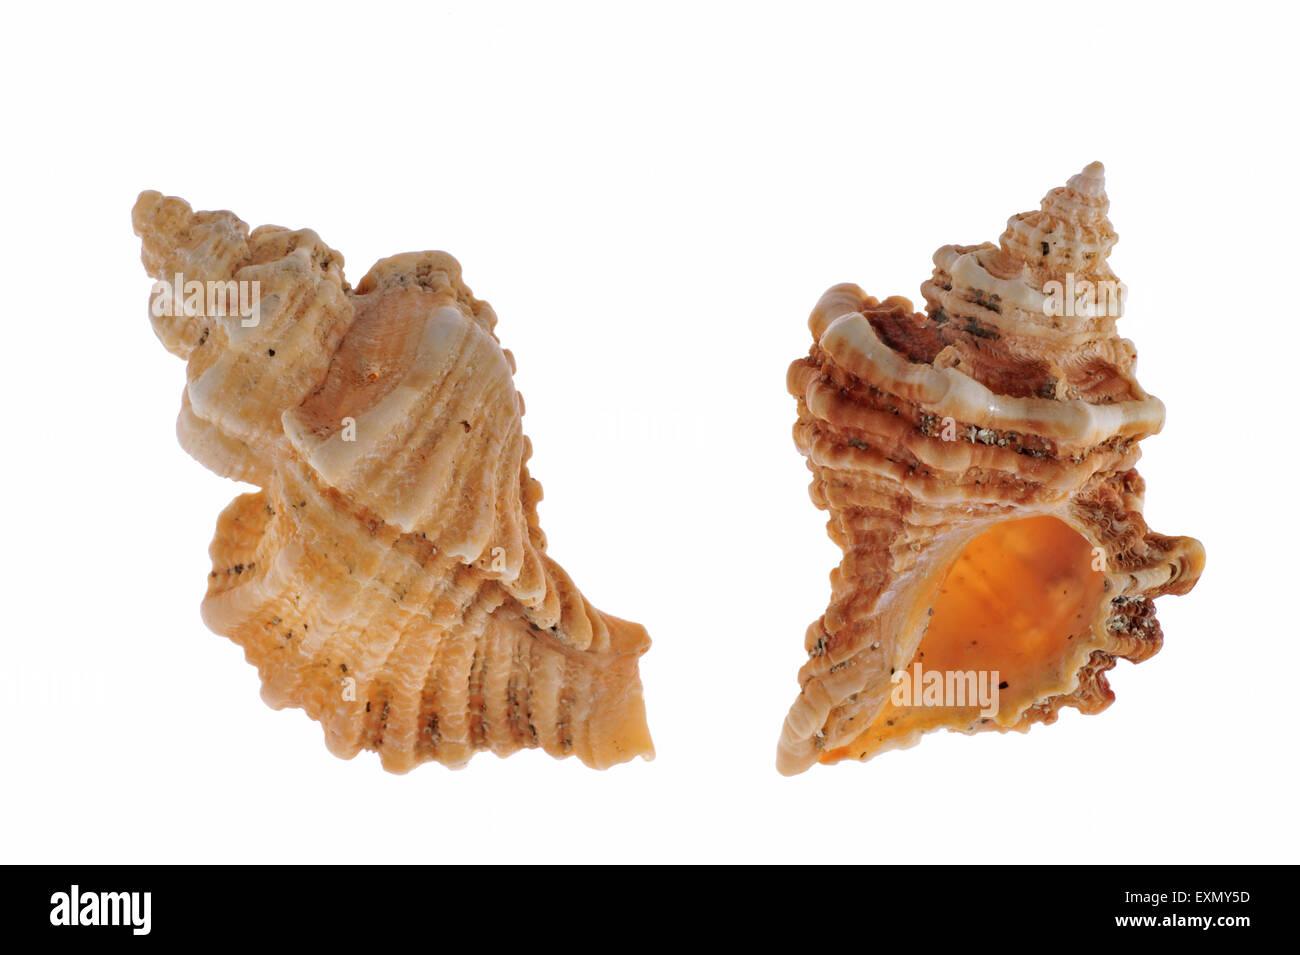 Sting winkle / Oyster drill / Hedgehog Murex (Ocenebra erinacea) shells on white background Stock Photo